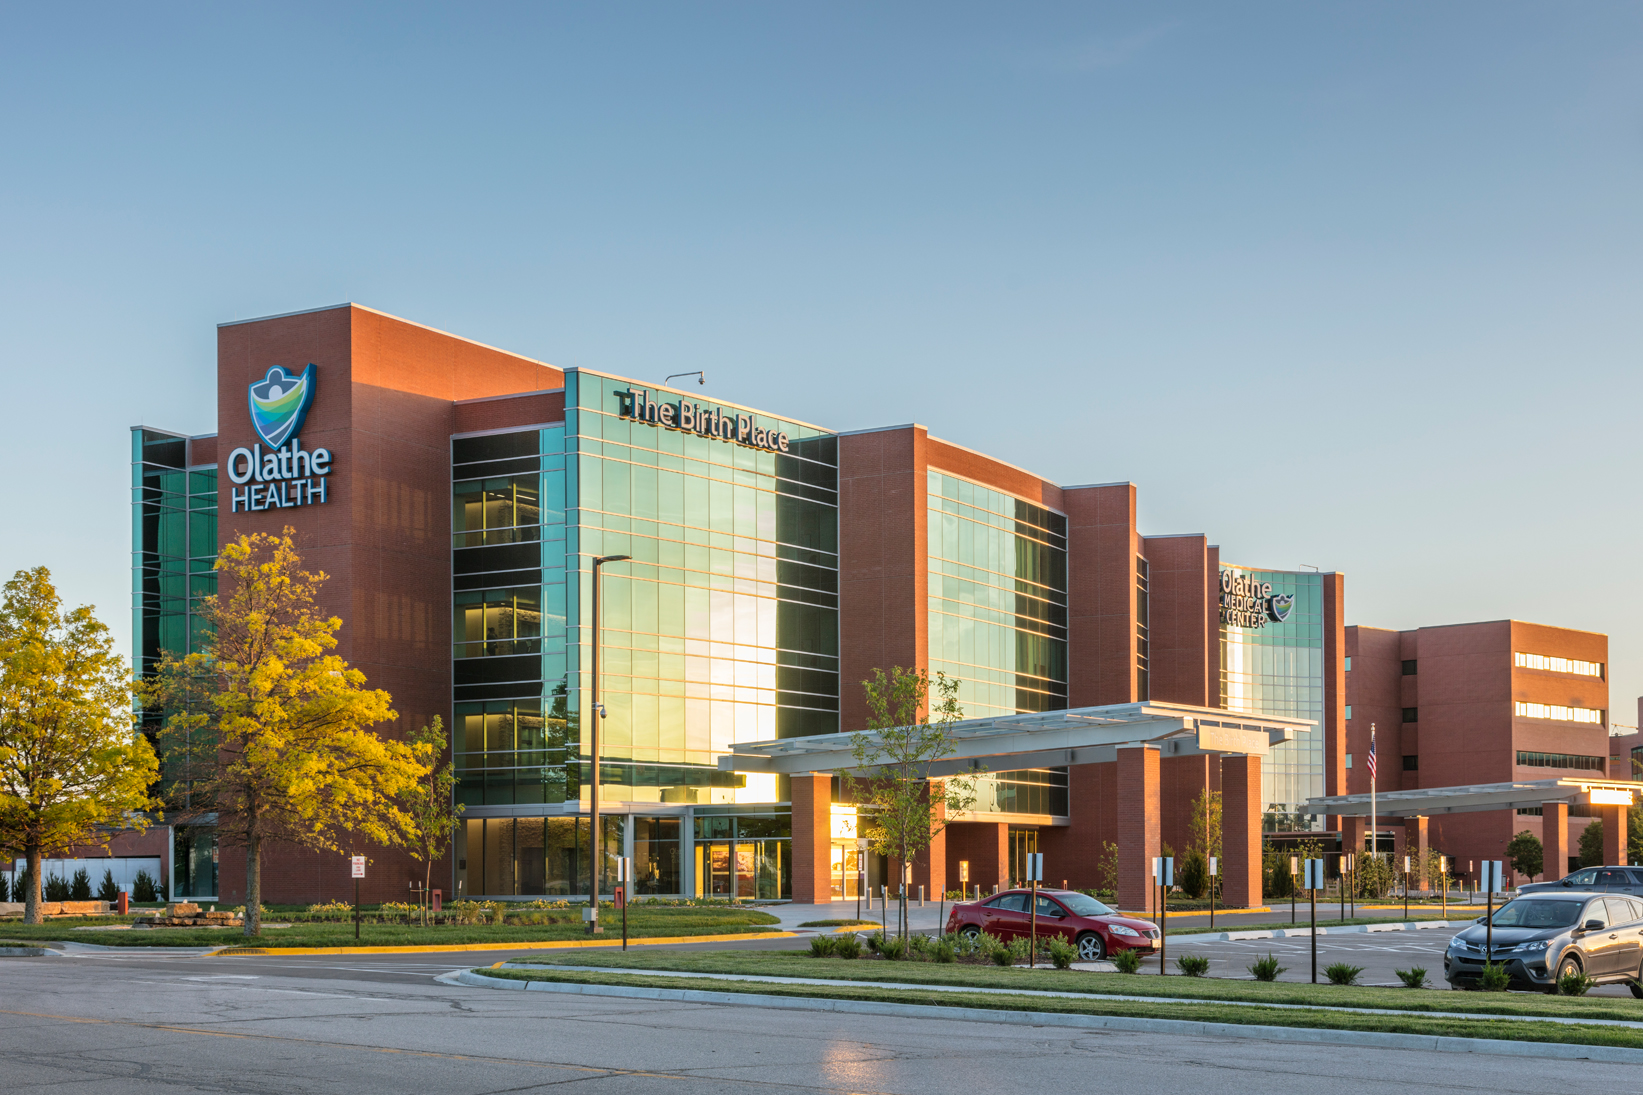 The birth place at olathe medical center architect magazine hmn architects inc olathe ks for American exteriors kc